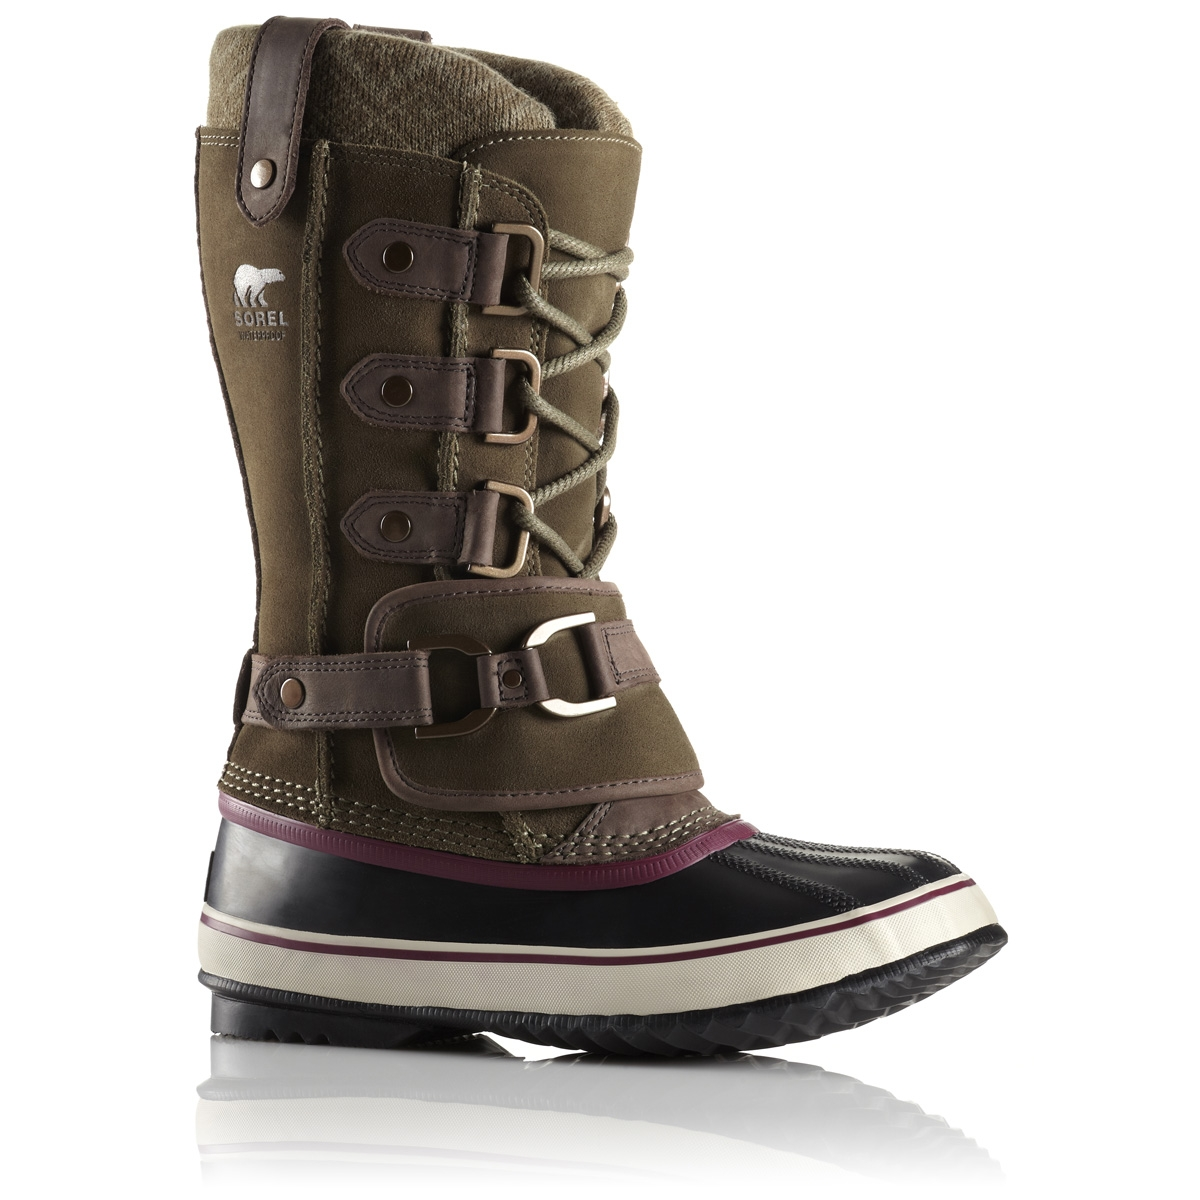 new images of united kingdom latest fashion Sorel Joan of Arctic Premium Boot (Women's) - Peatmoss